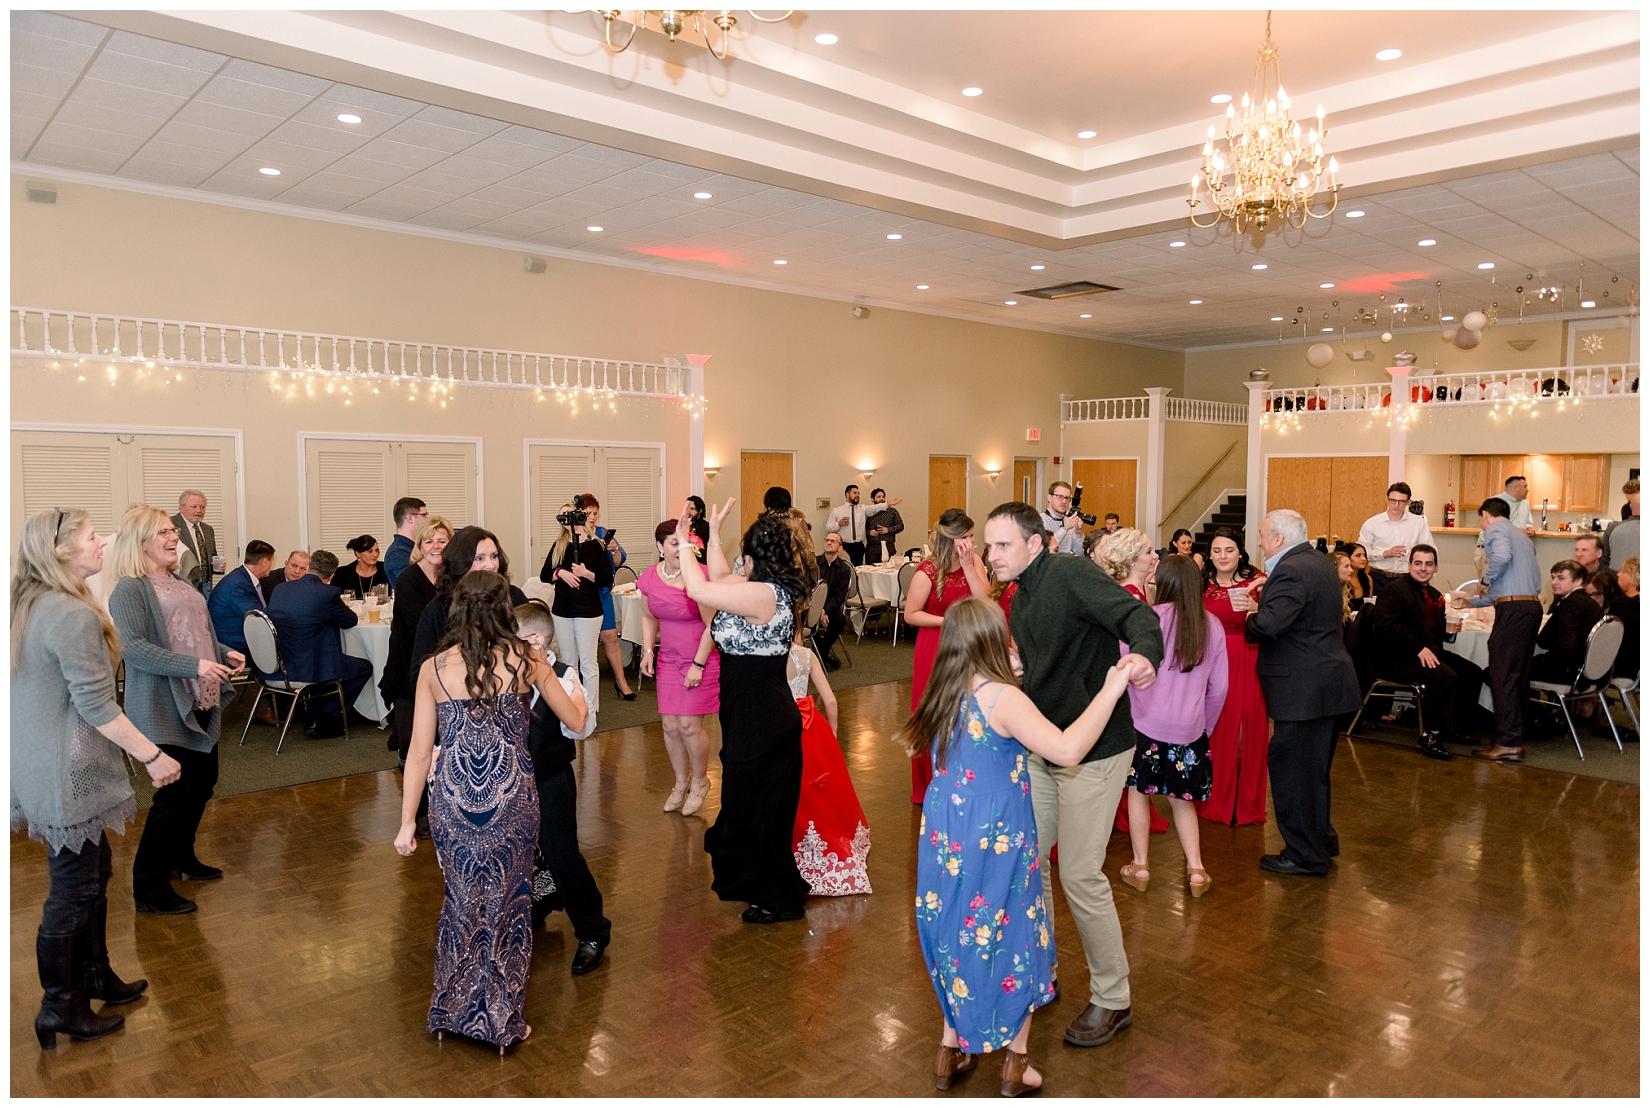 cat-alkire-wedding-photographer-indiana-chicago-indianapolis-fort-wayne_1128.jpg